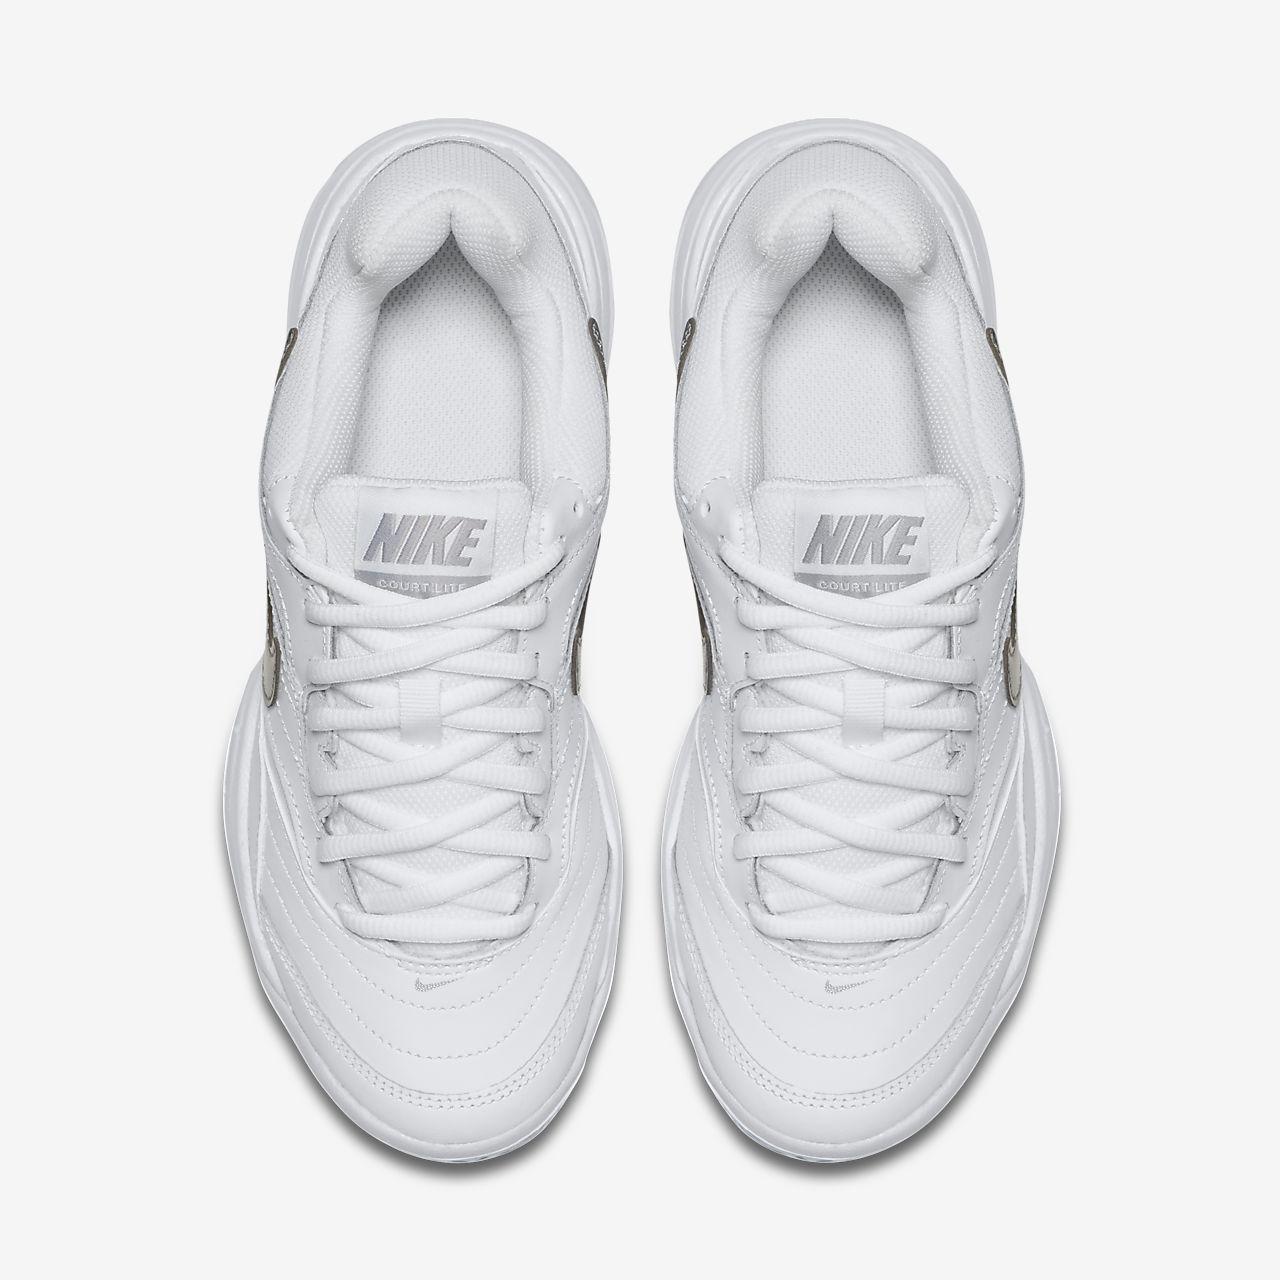 super popular 499bb 4619b ... NikeCourt Lite Women s Hard Court Tennis Shoe